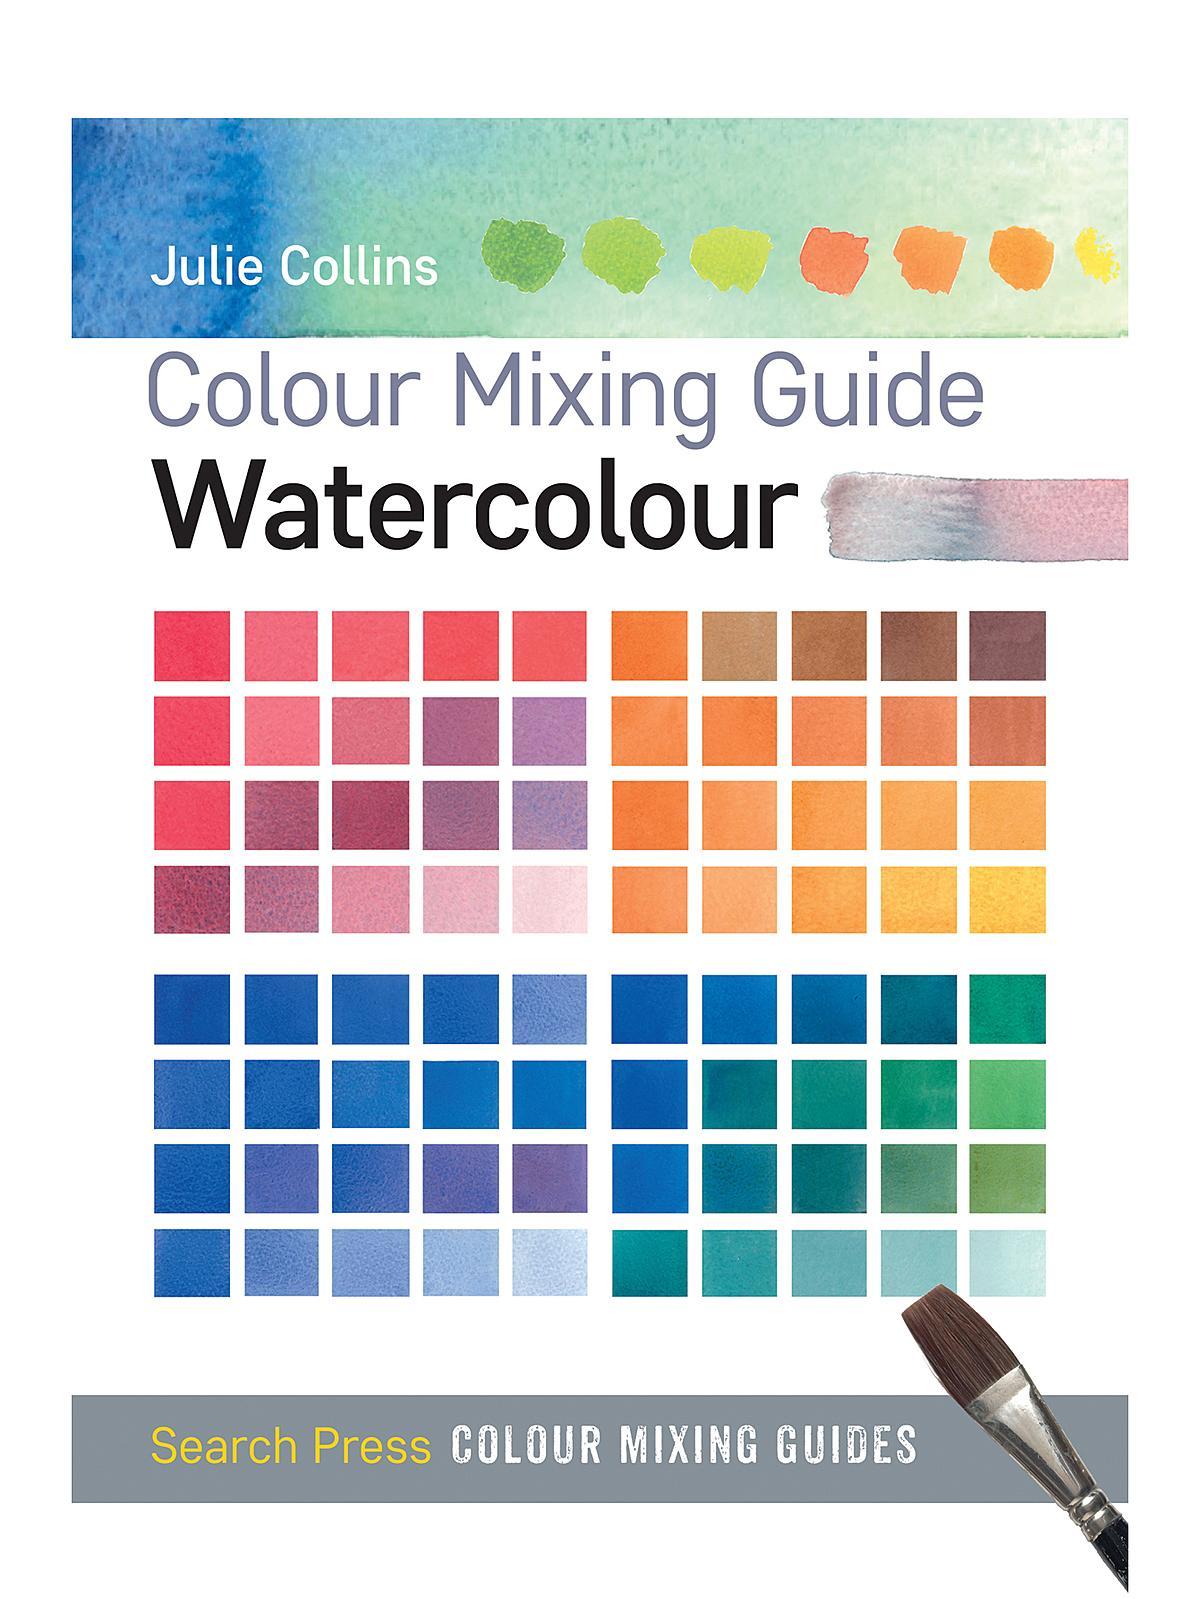 Colour Mixing Guide: Watercolour